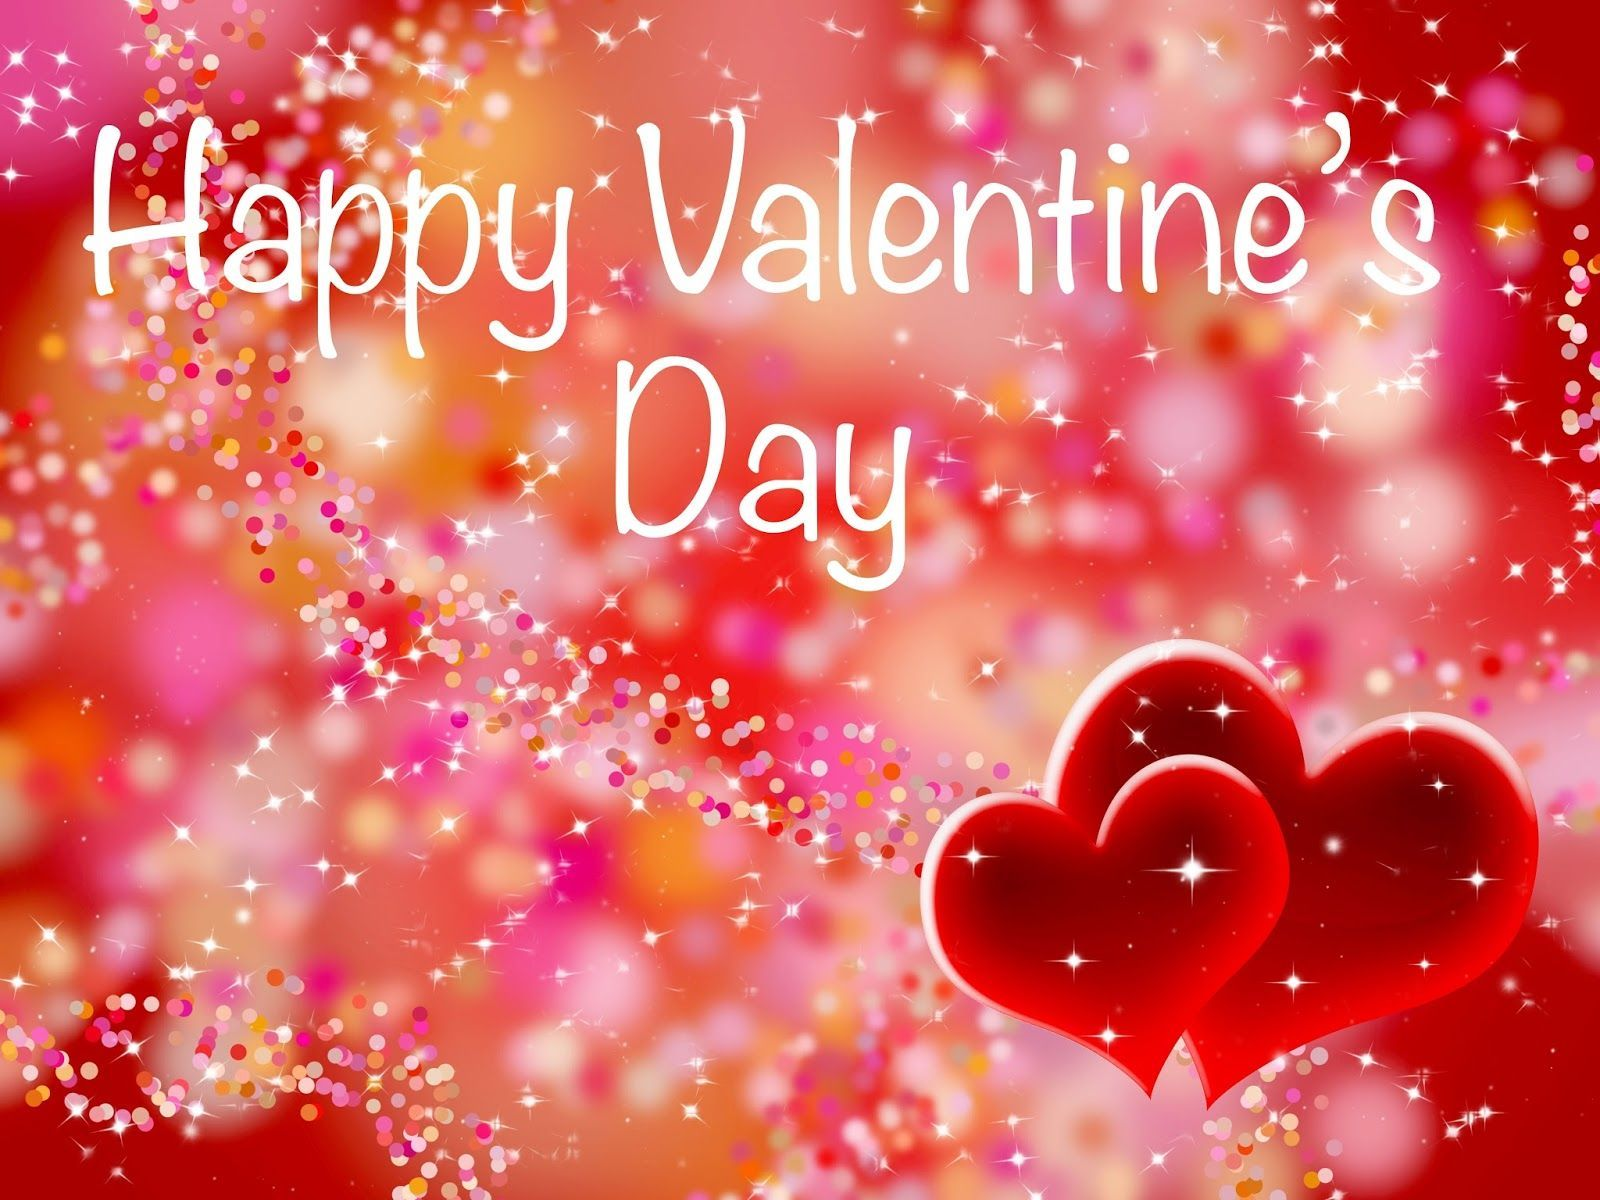 Happy Valentines Day Picturesgg 16001200 Happy